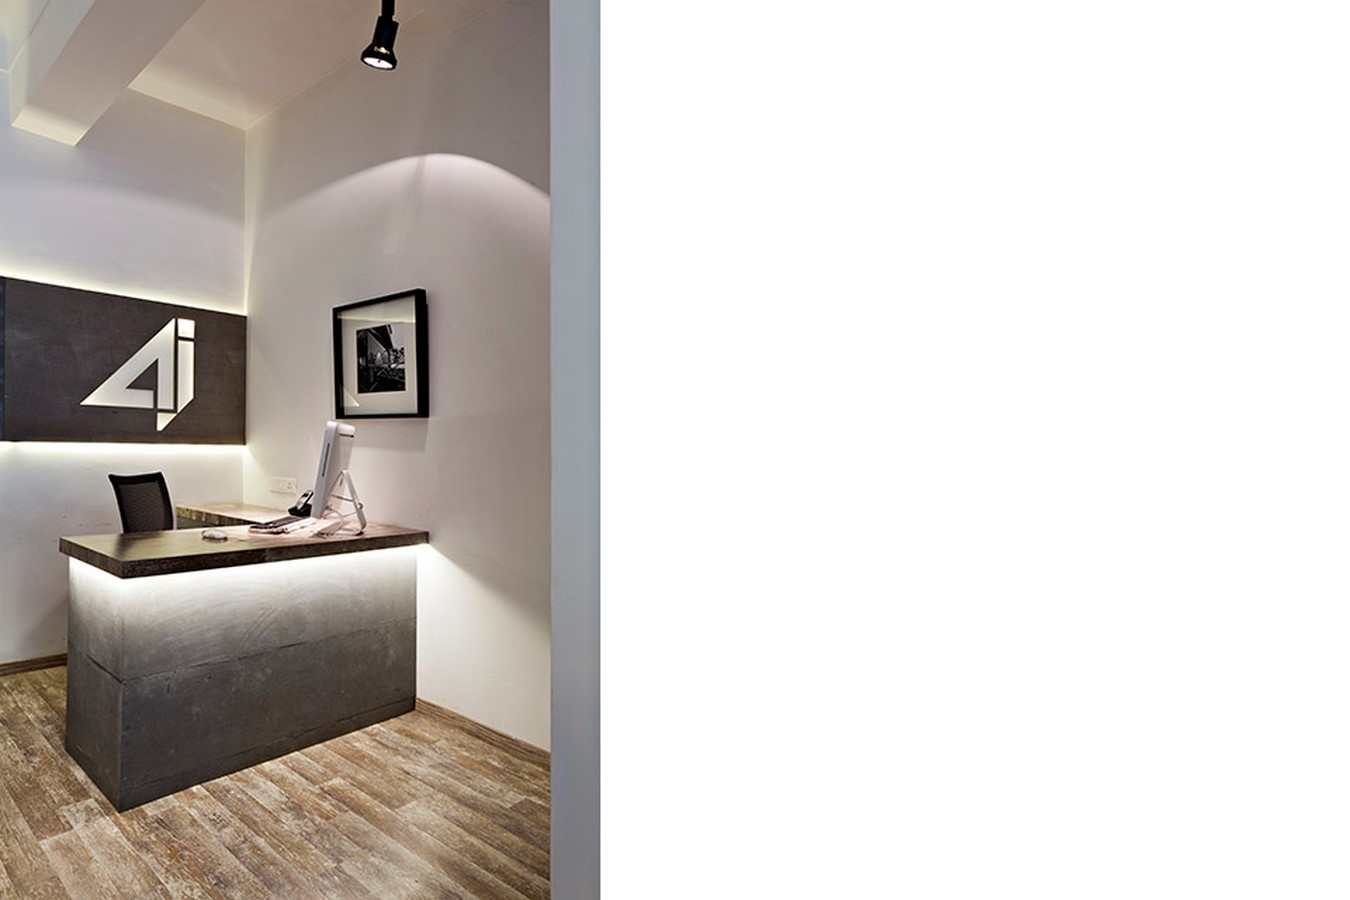 AJA Studio - Sheet3